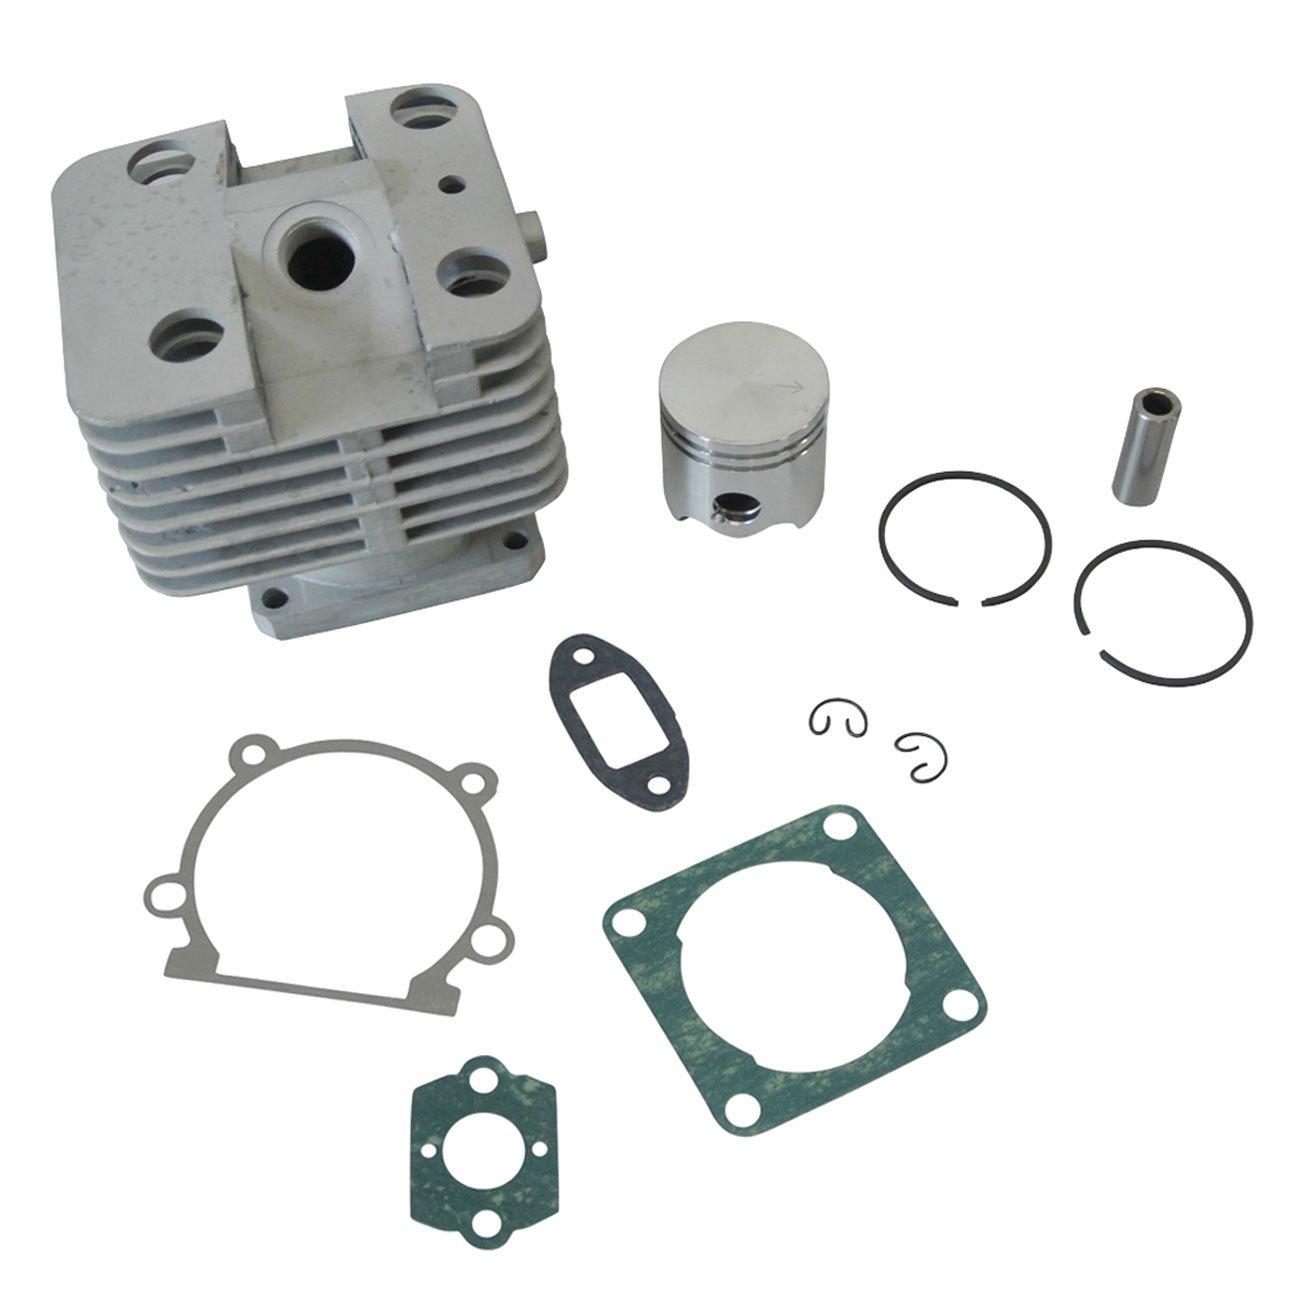 JRL Zylinder-Kolben Replica Passform Stihl FS250 fs250r FS200 fs200r FS120 35 mm 4134 020 1213 Huang Machinery